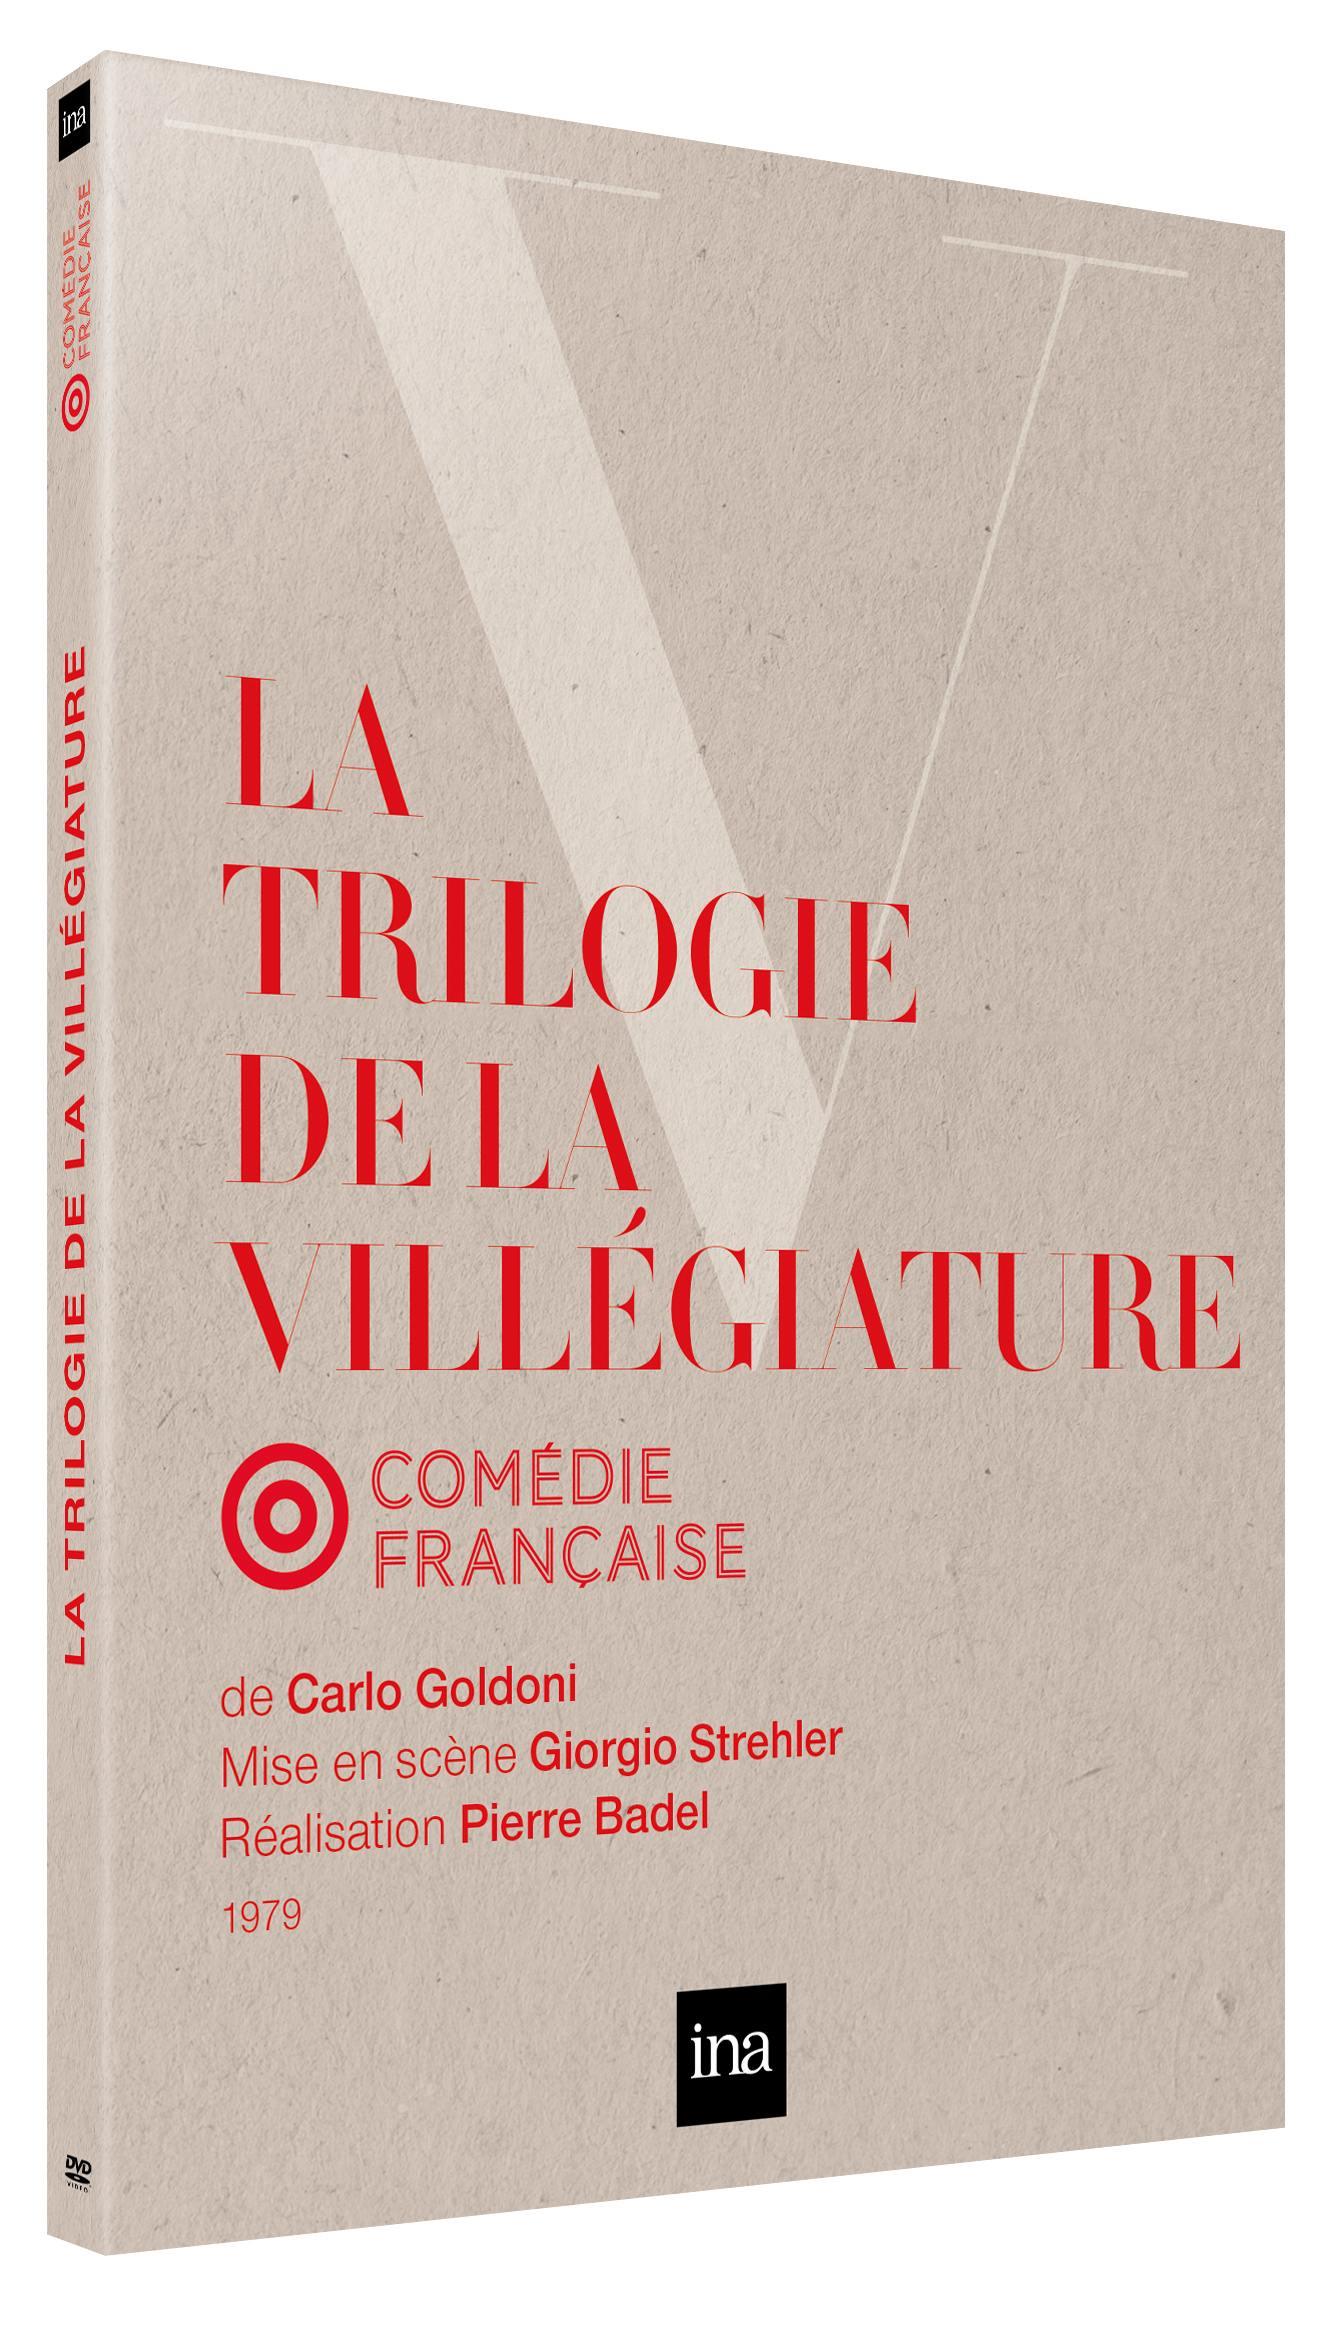 Trilogie de la villegiature (la) - 2 dvd